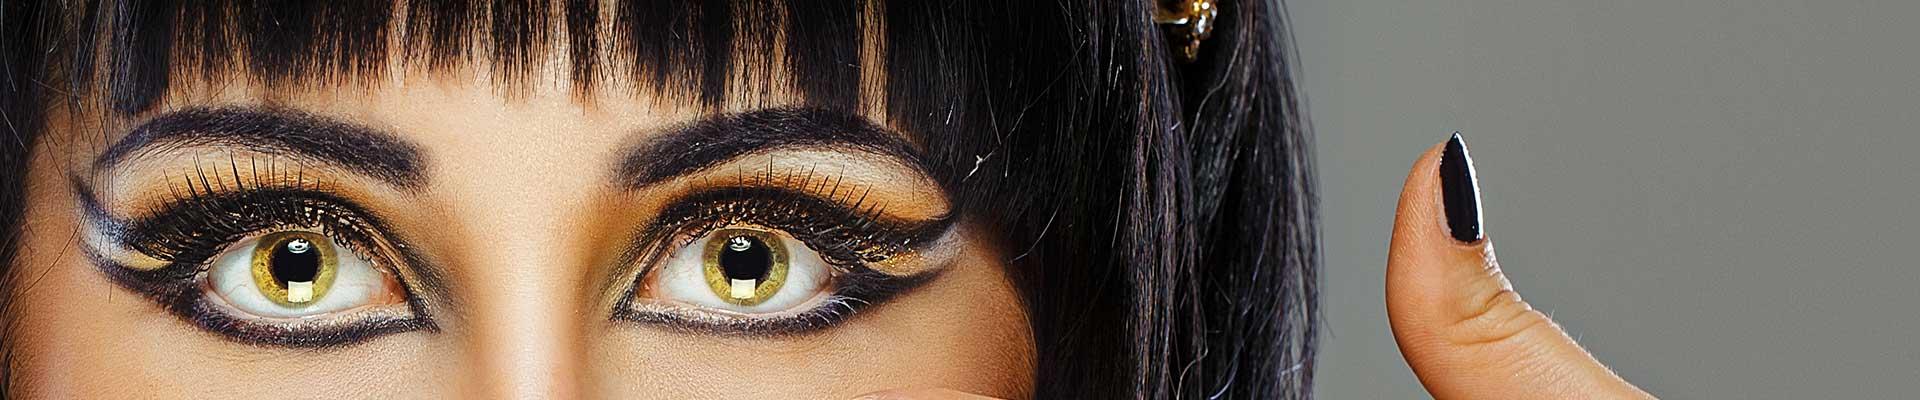 dame med gule øyne